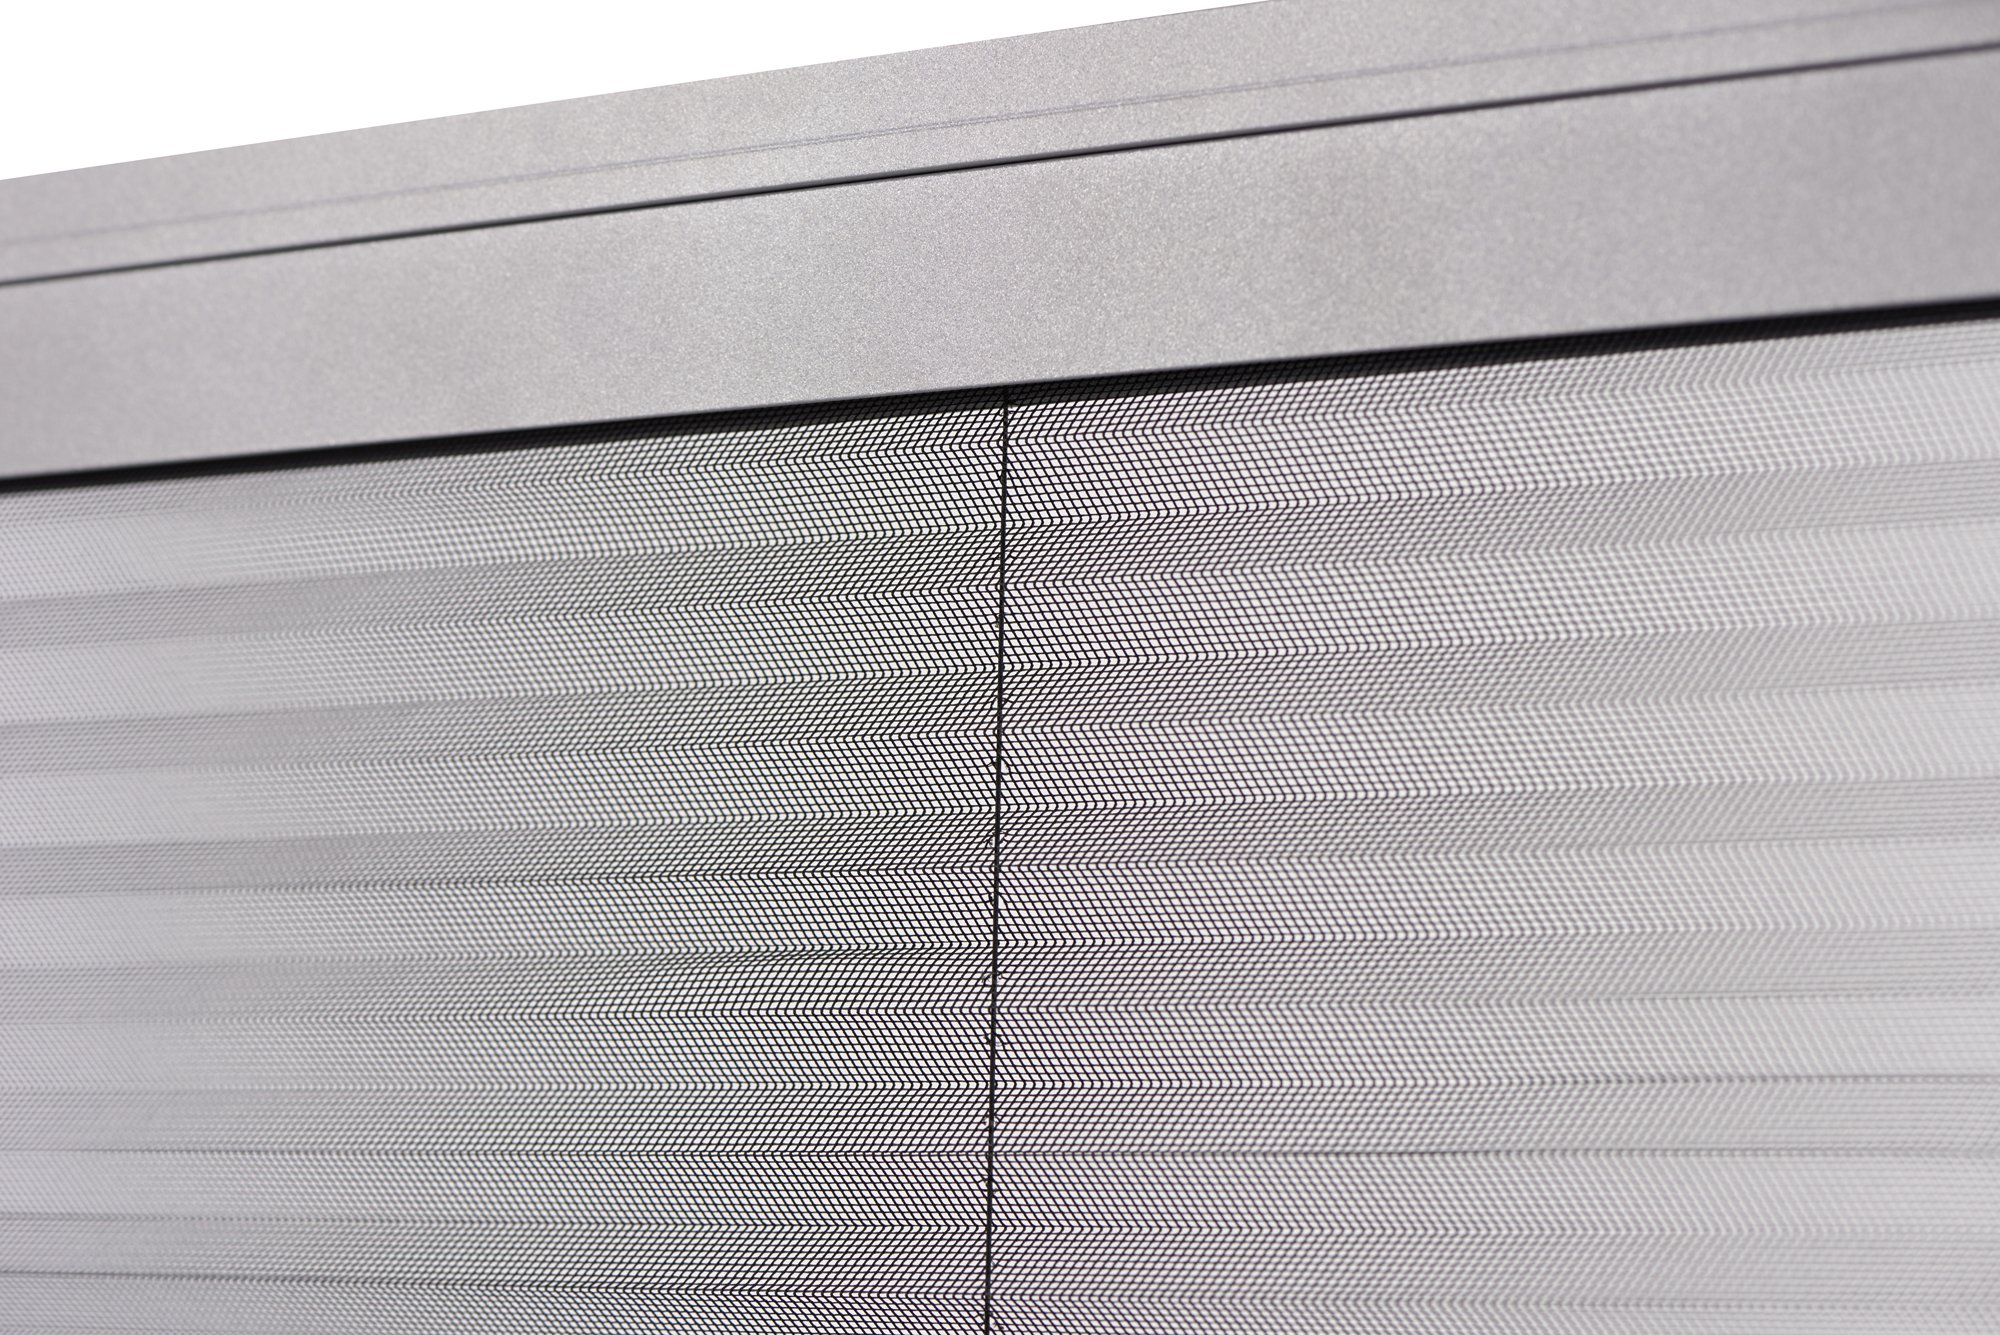 fliegengitter lichts chachtabdeckung, fliegengitter dachfenster, insektenschutzgitter, spannrahmen, insektenschutz, fliegengitter, dachfenster, plissee